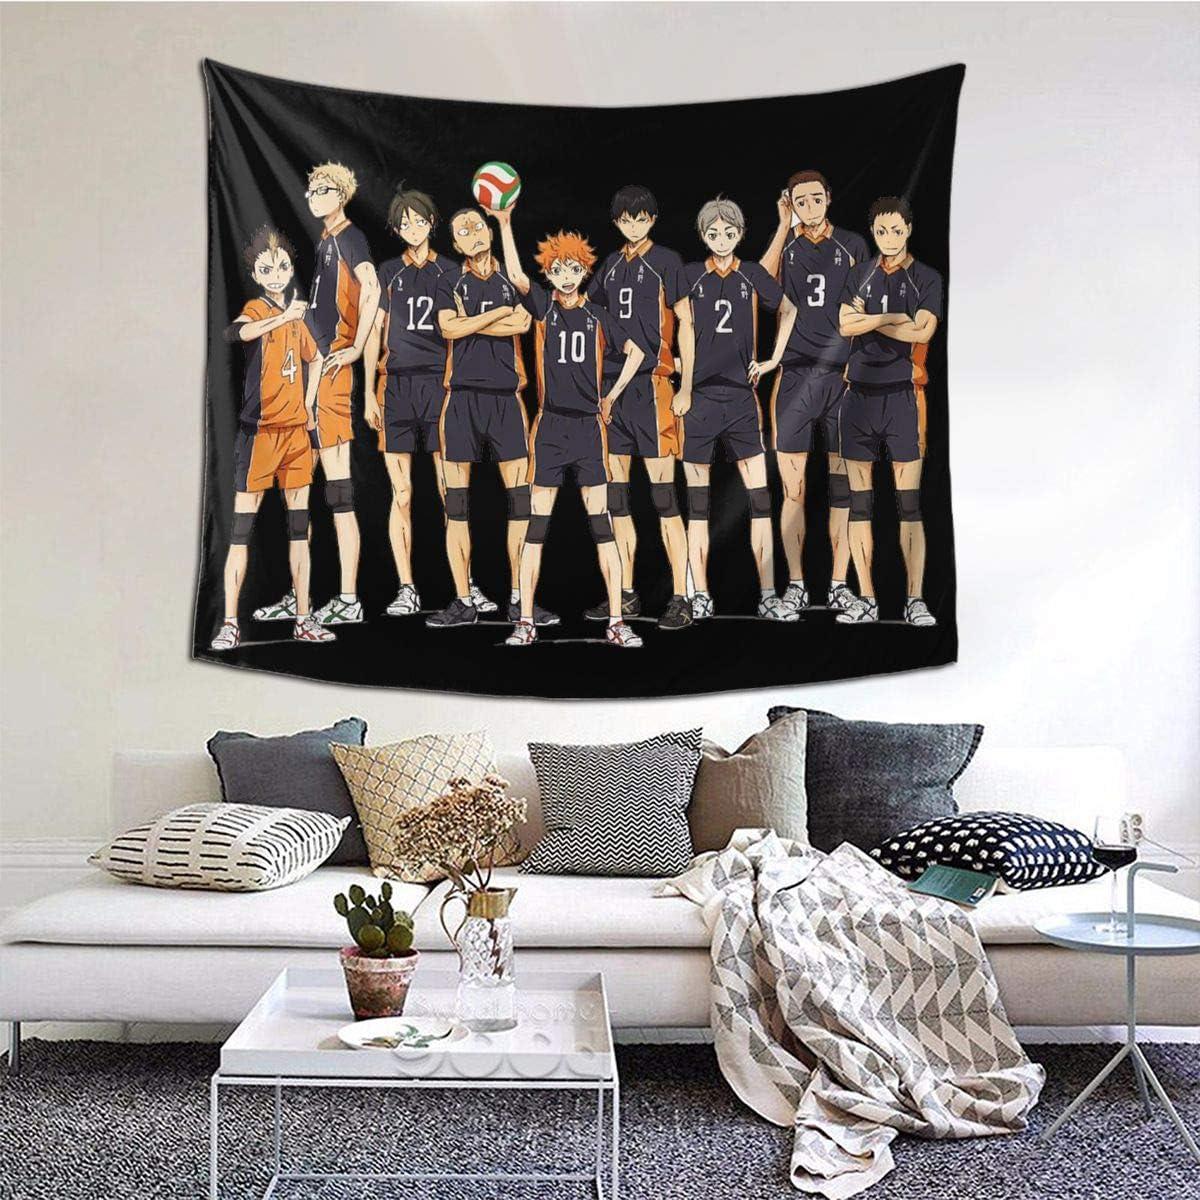 Boniuniu Haikyuu Home Decoration Tapestry for Room Wall Hanging Mural Bedroom Living Room – 60 X 51 Inch